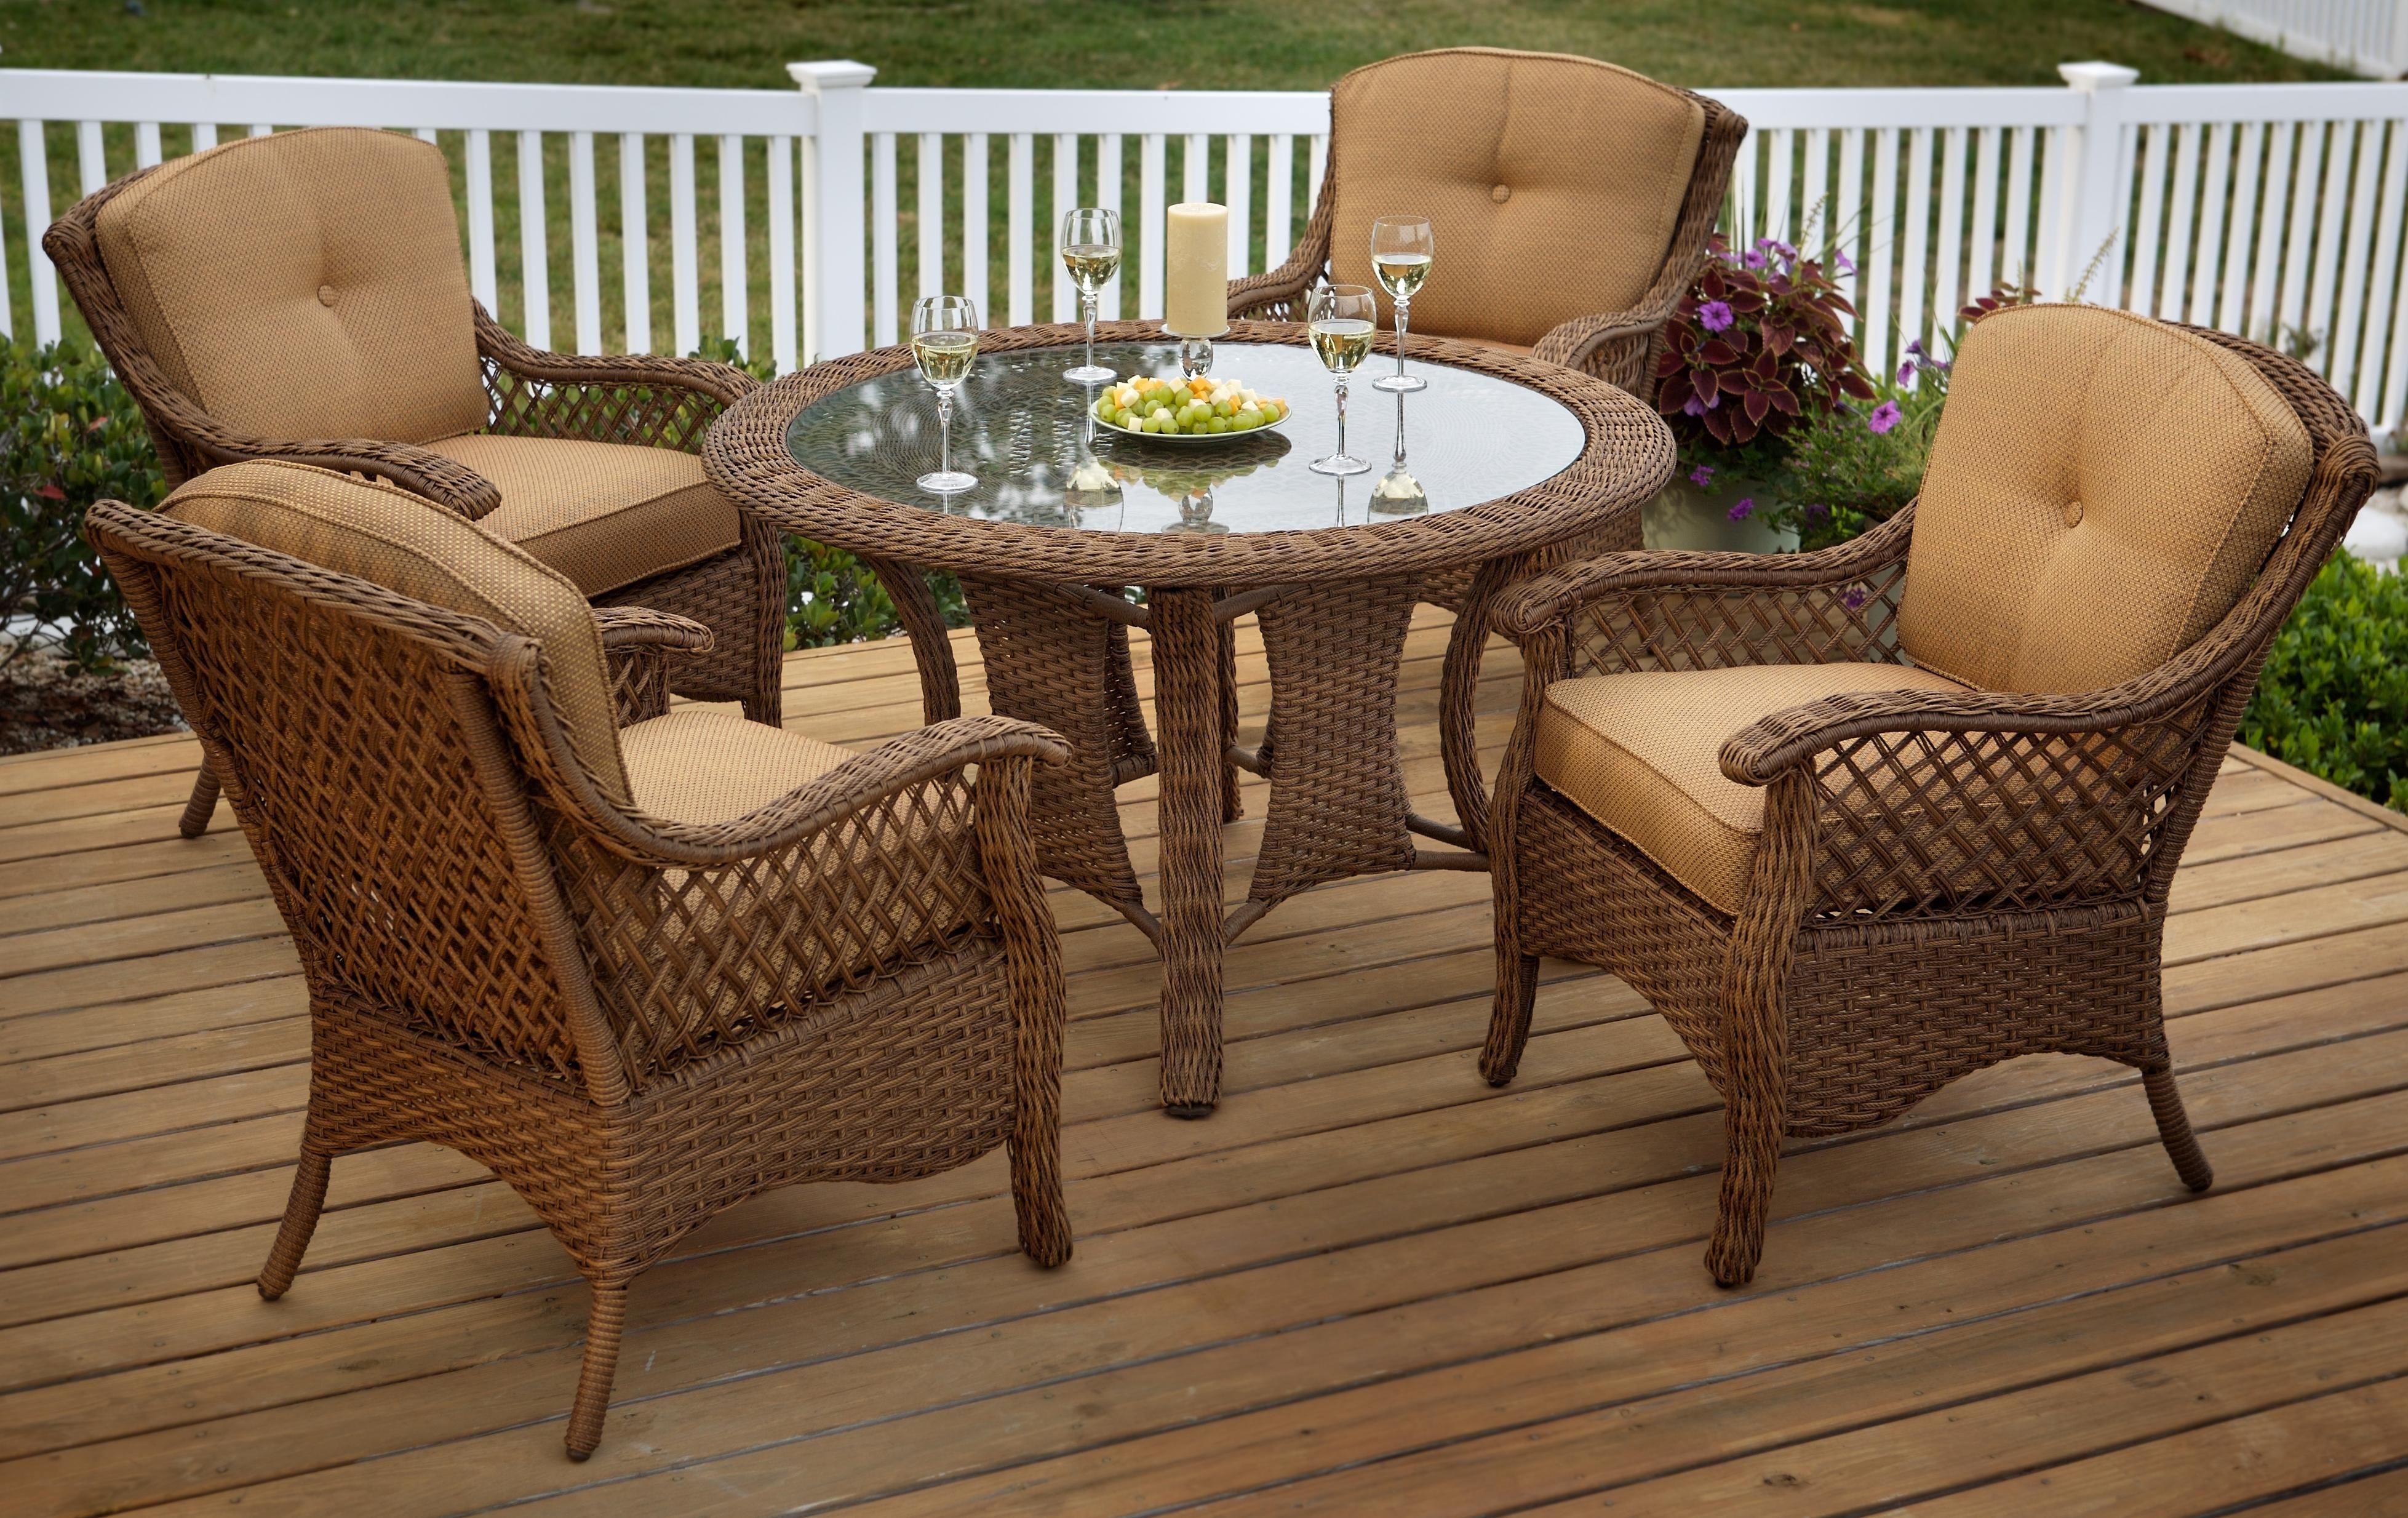 veranda agio 5 outdoor dining set by agio agio Agio Patio Furniture id=76671